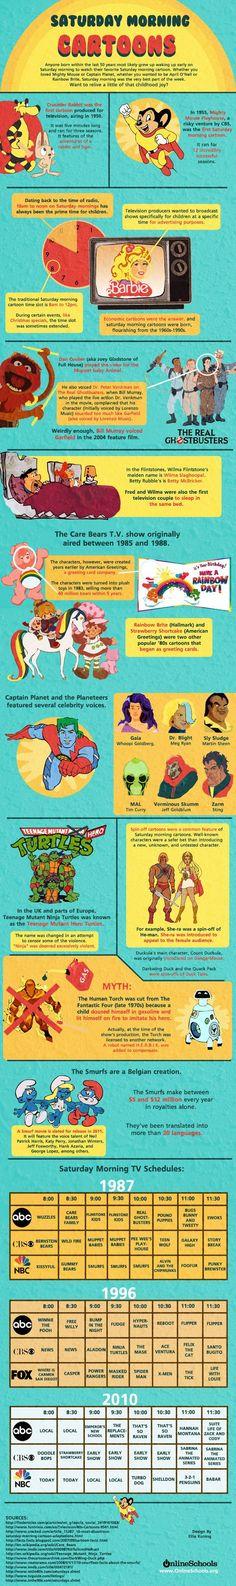 80's Saturday Morning Cartoons Cartoon Photo, Cartoon Tv, Old Cartoons, Classic Cartoons, 90s Childhood, Childhood Memories, Tante Emma Laden, Nerd, Saturday Morning Cartoons